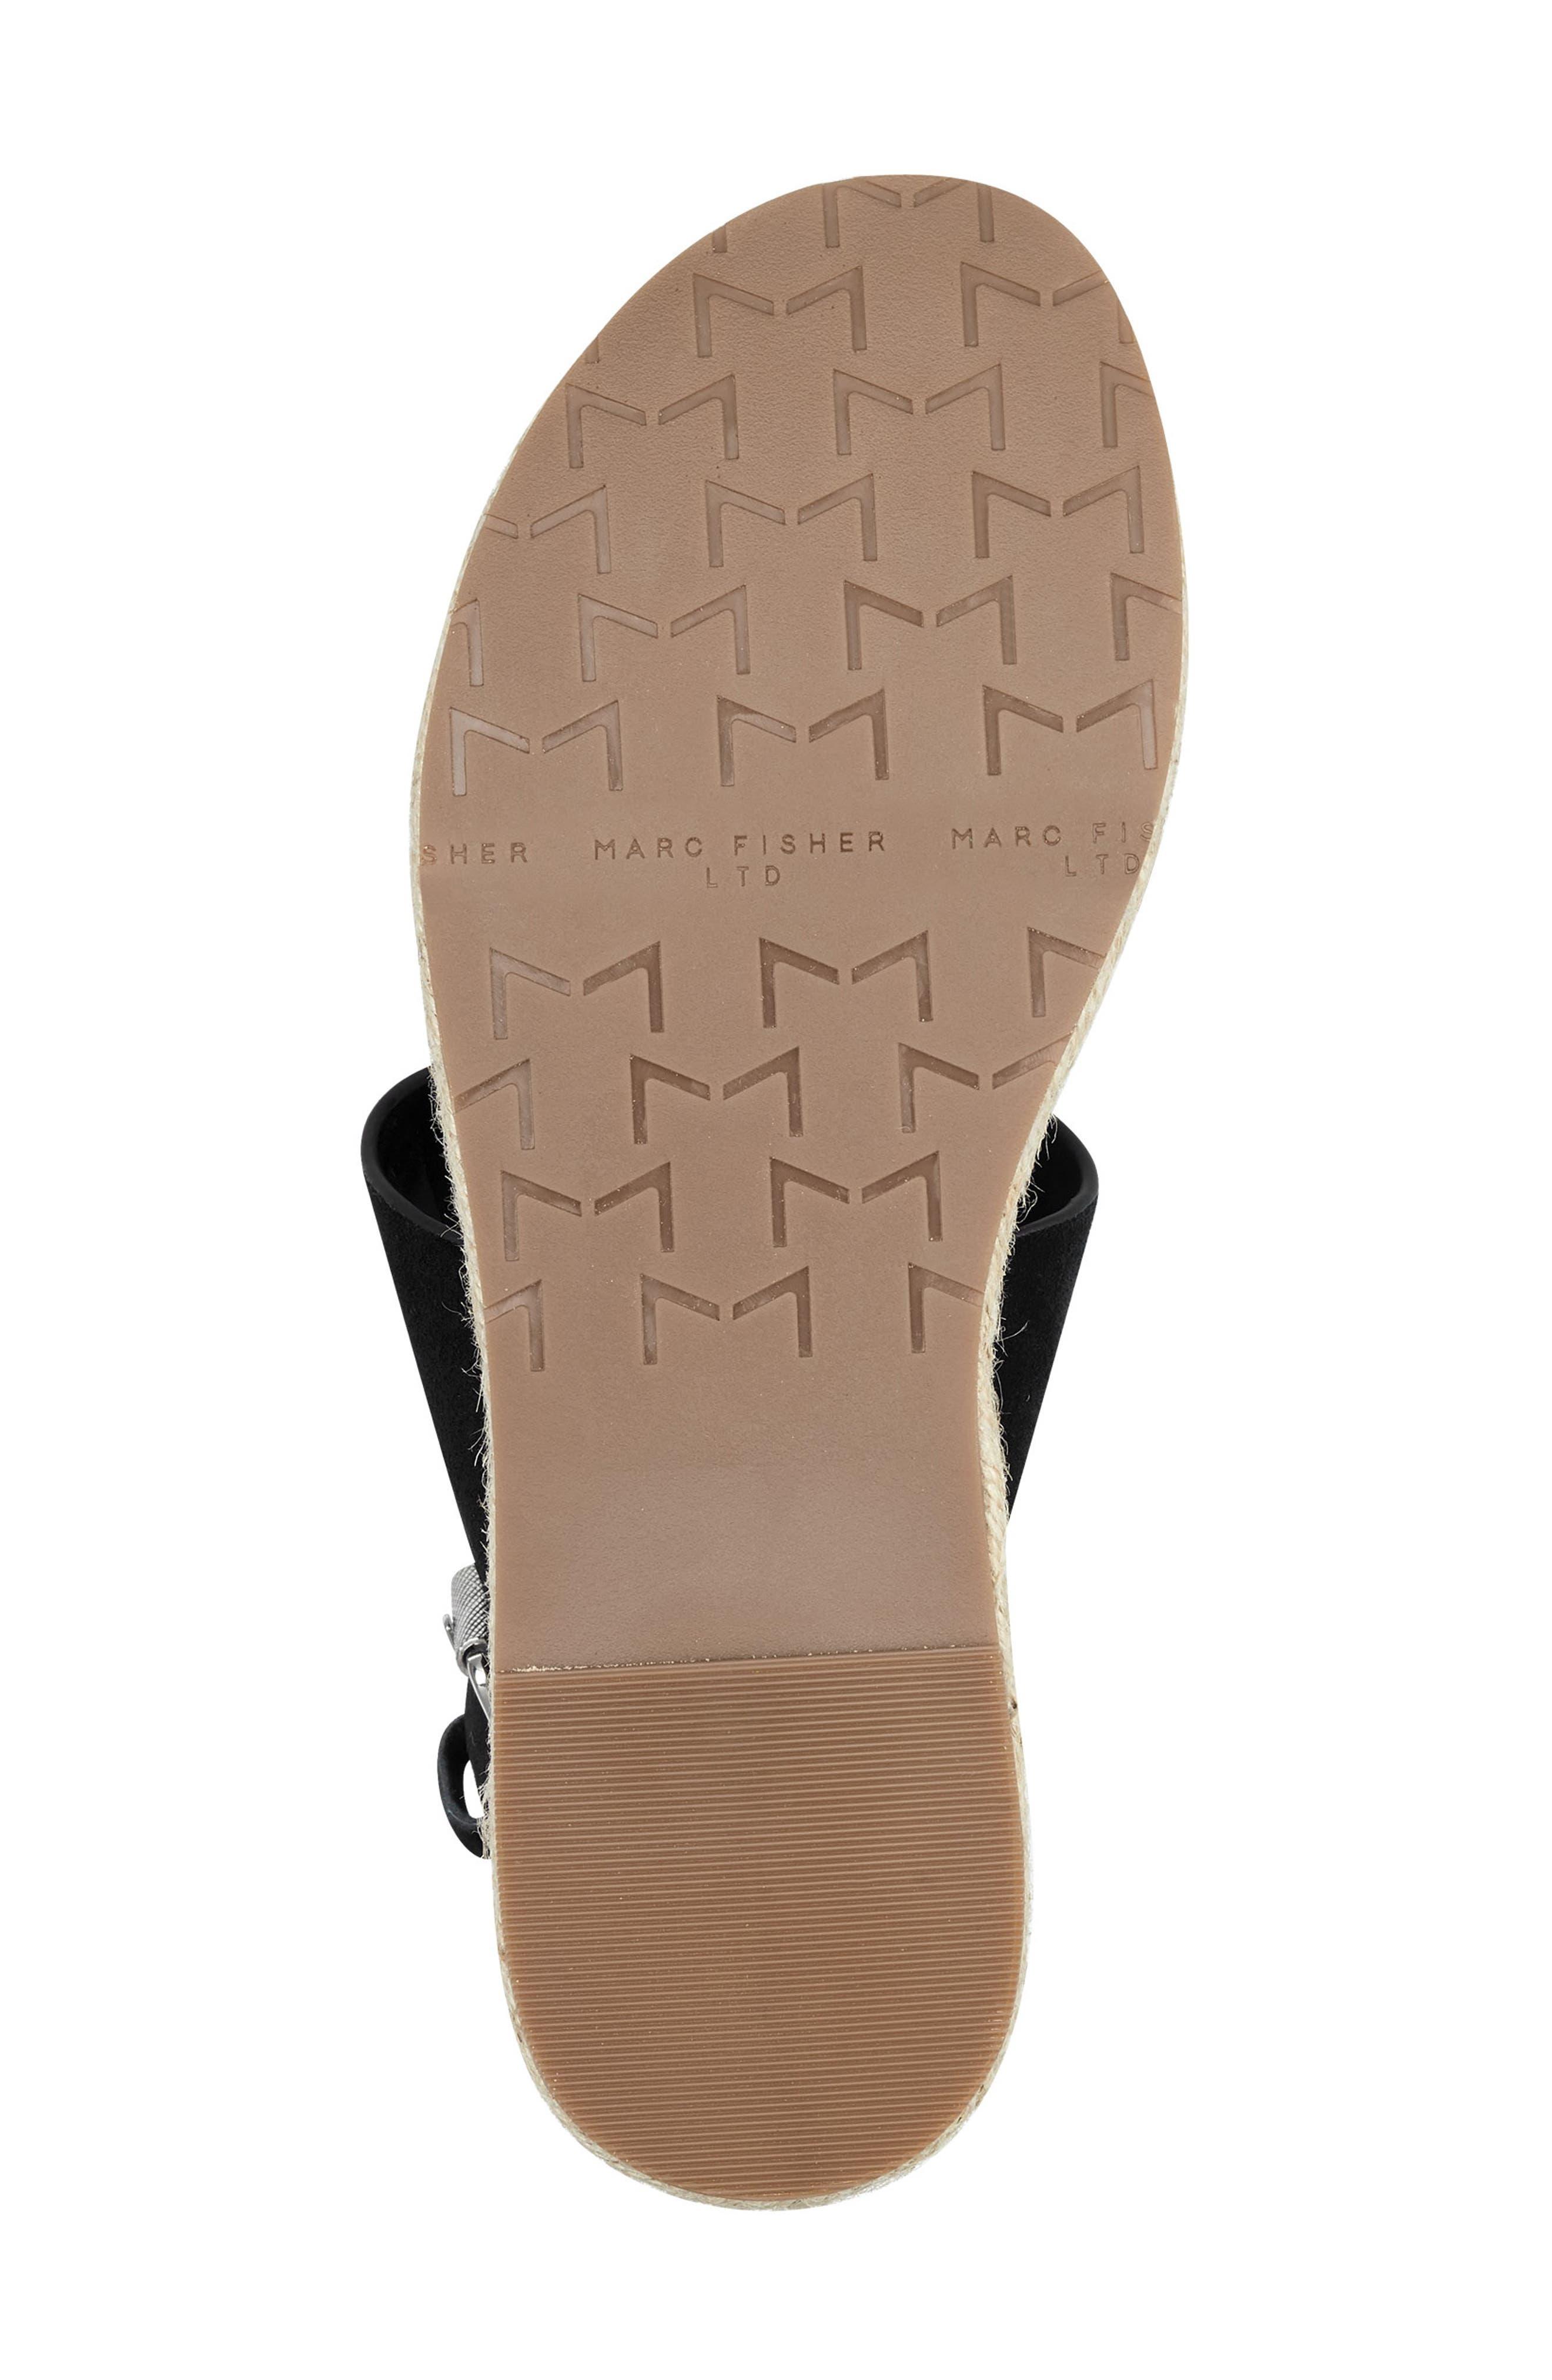 MARC FISHER LTD, Oria Espadrille Platform Sandal, Alternate thumbnail 6, color, BLACK SUEDE